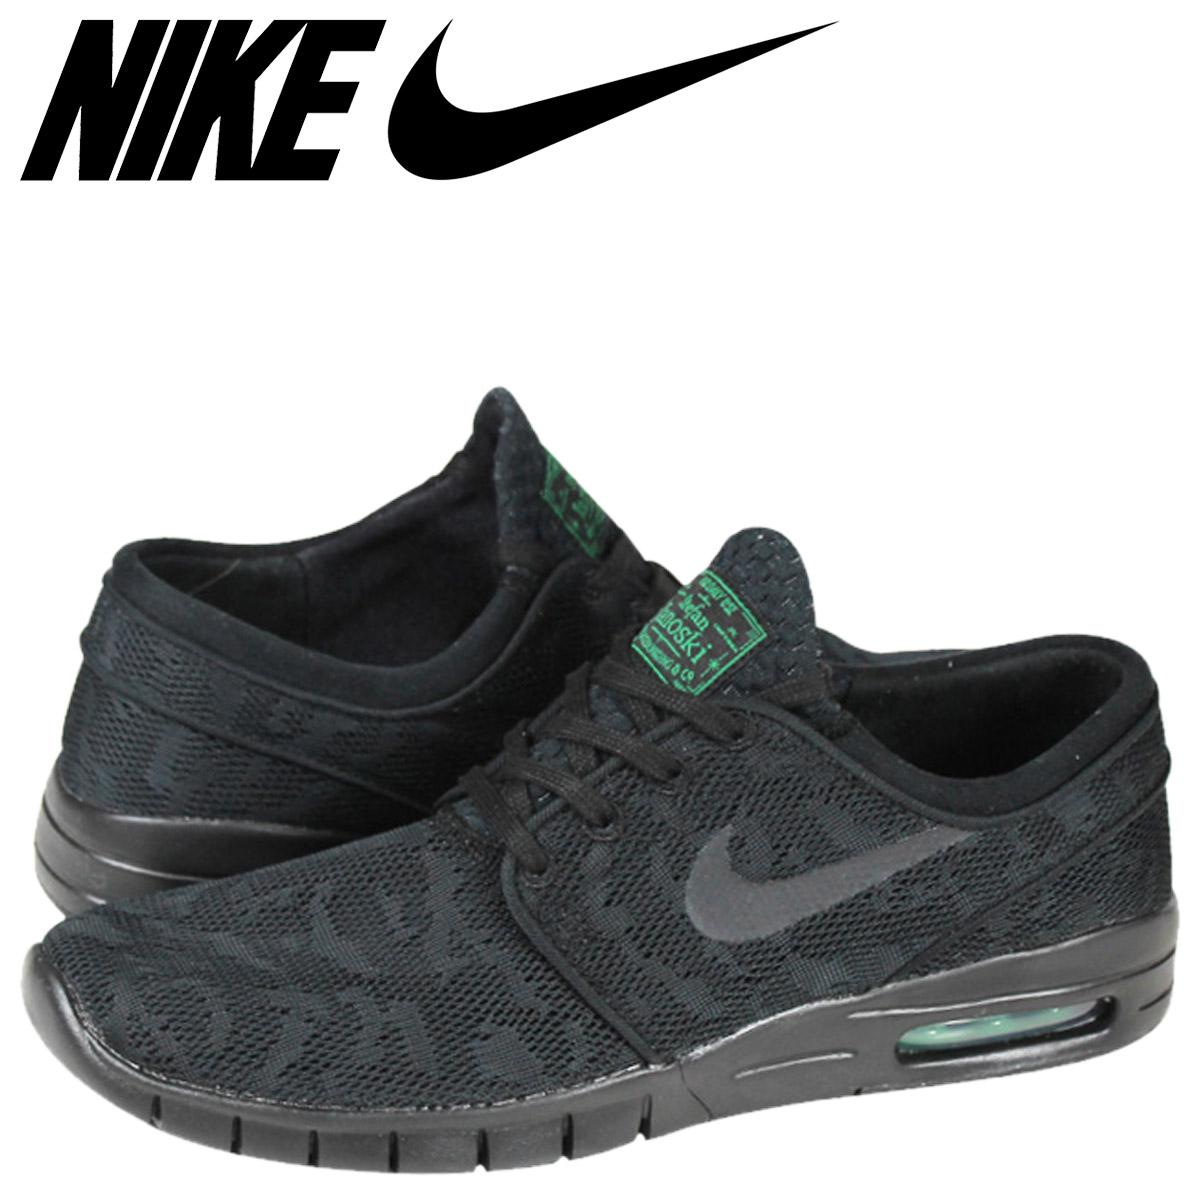 Nike NIKE SB STEFAN JANOSKI MAX sneakers skateboarding Stefan janoski Max mesh mens 631303-003 BLK/BLK-P. GRN black [1 / 6 new in stock] [regular] ★ ★